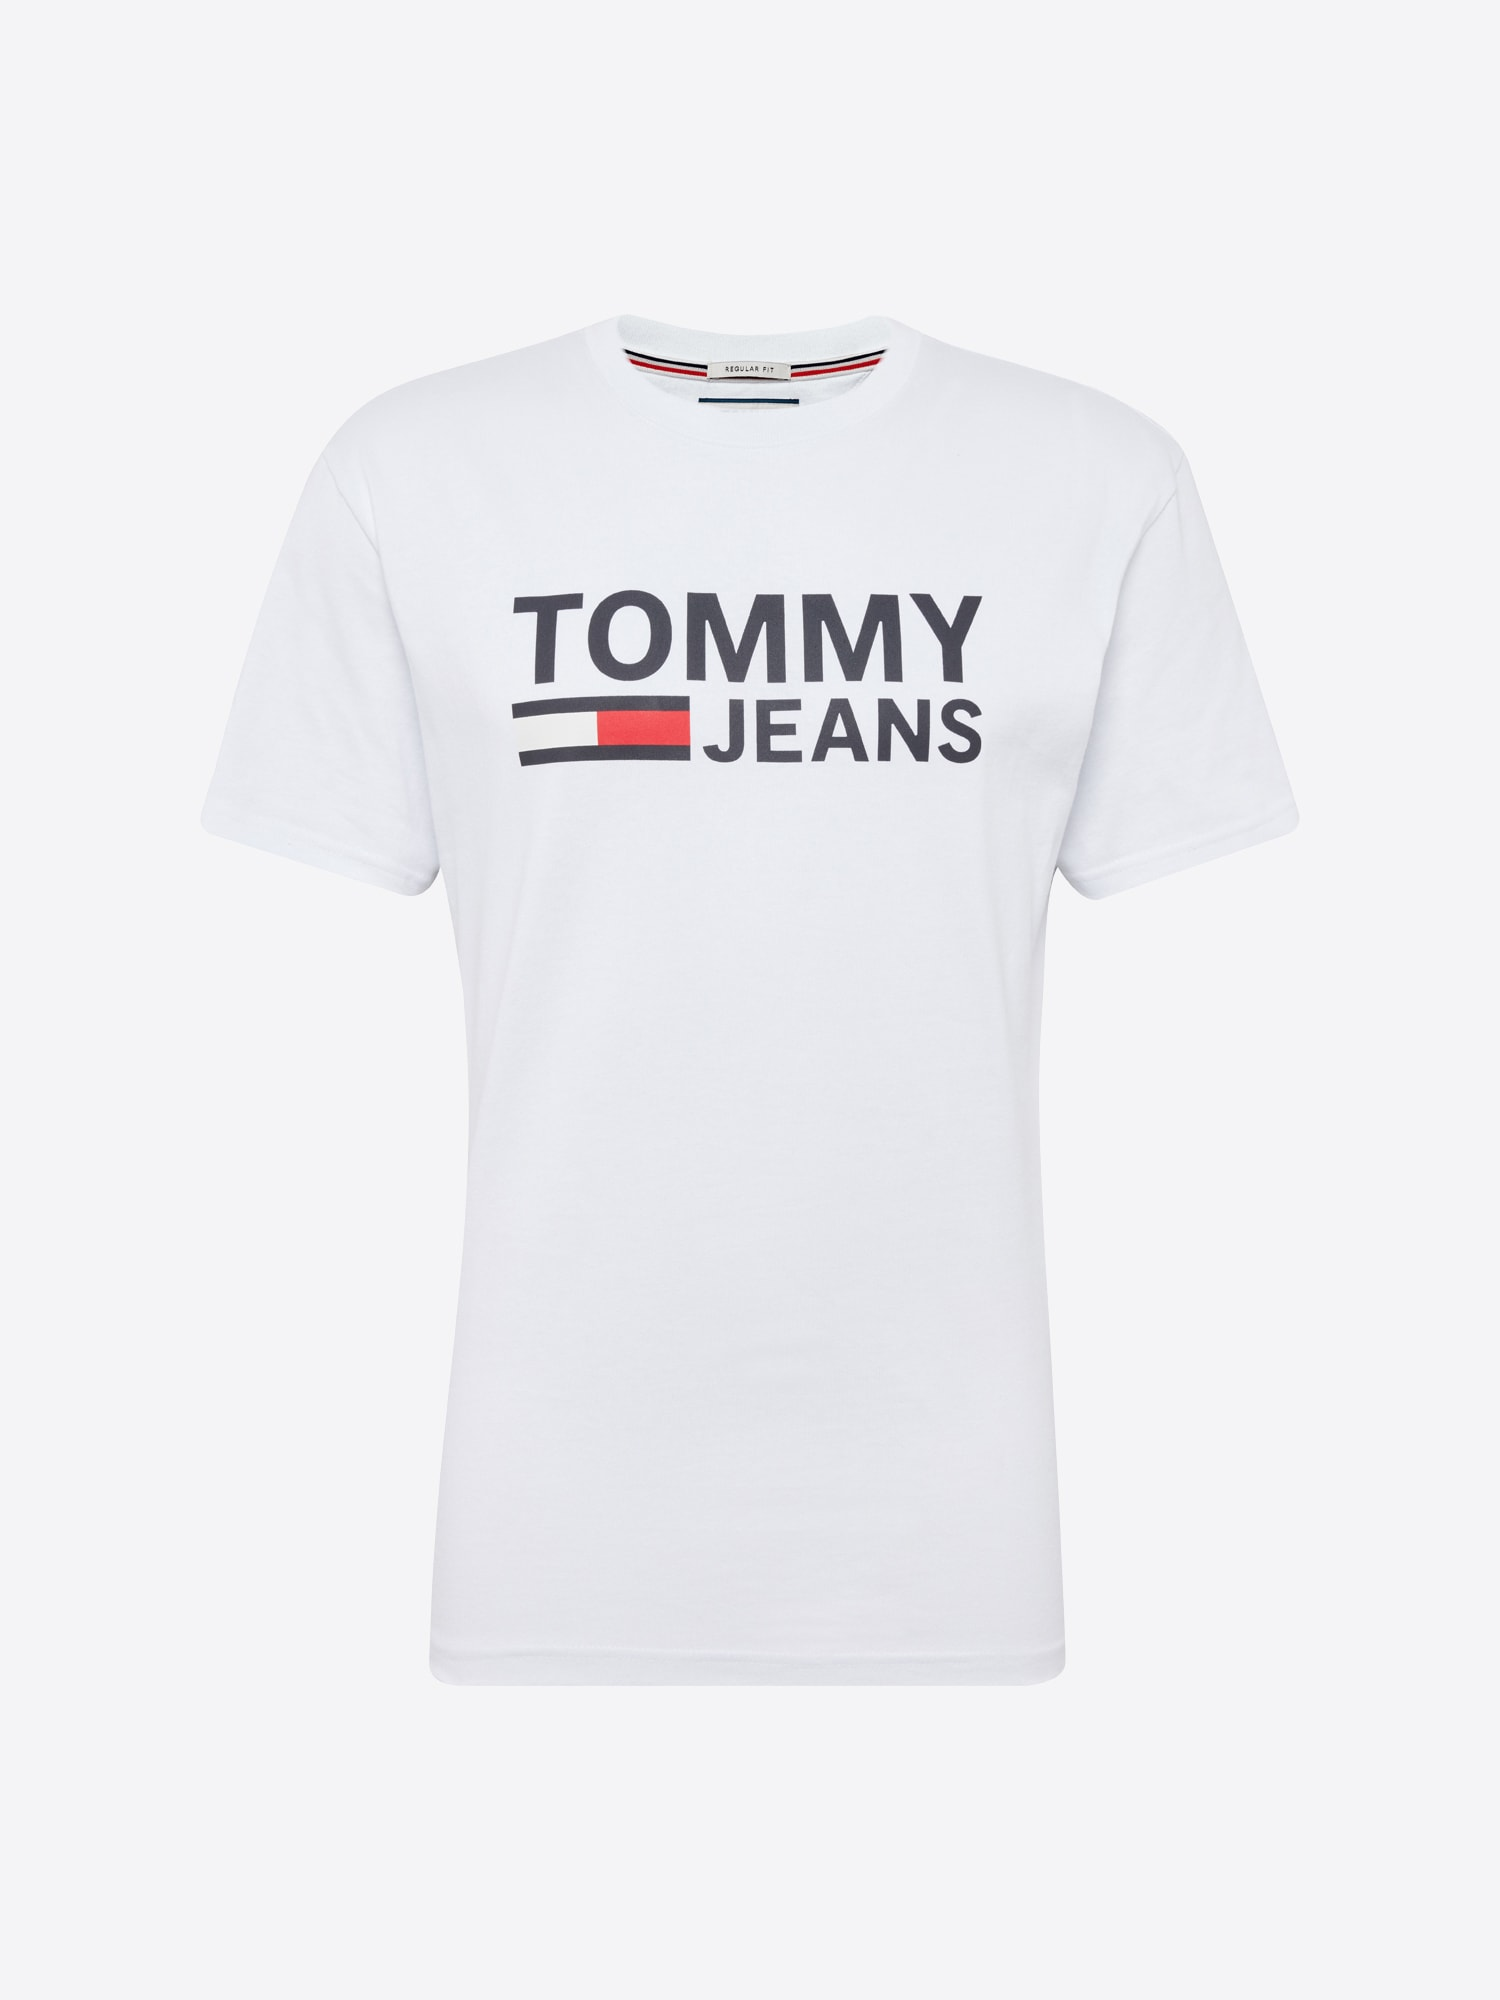 Tričko TJM TOMMY CLASSICS LOGO TEE tmavě modrá bílá Tommy Jeans